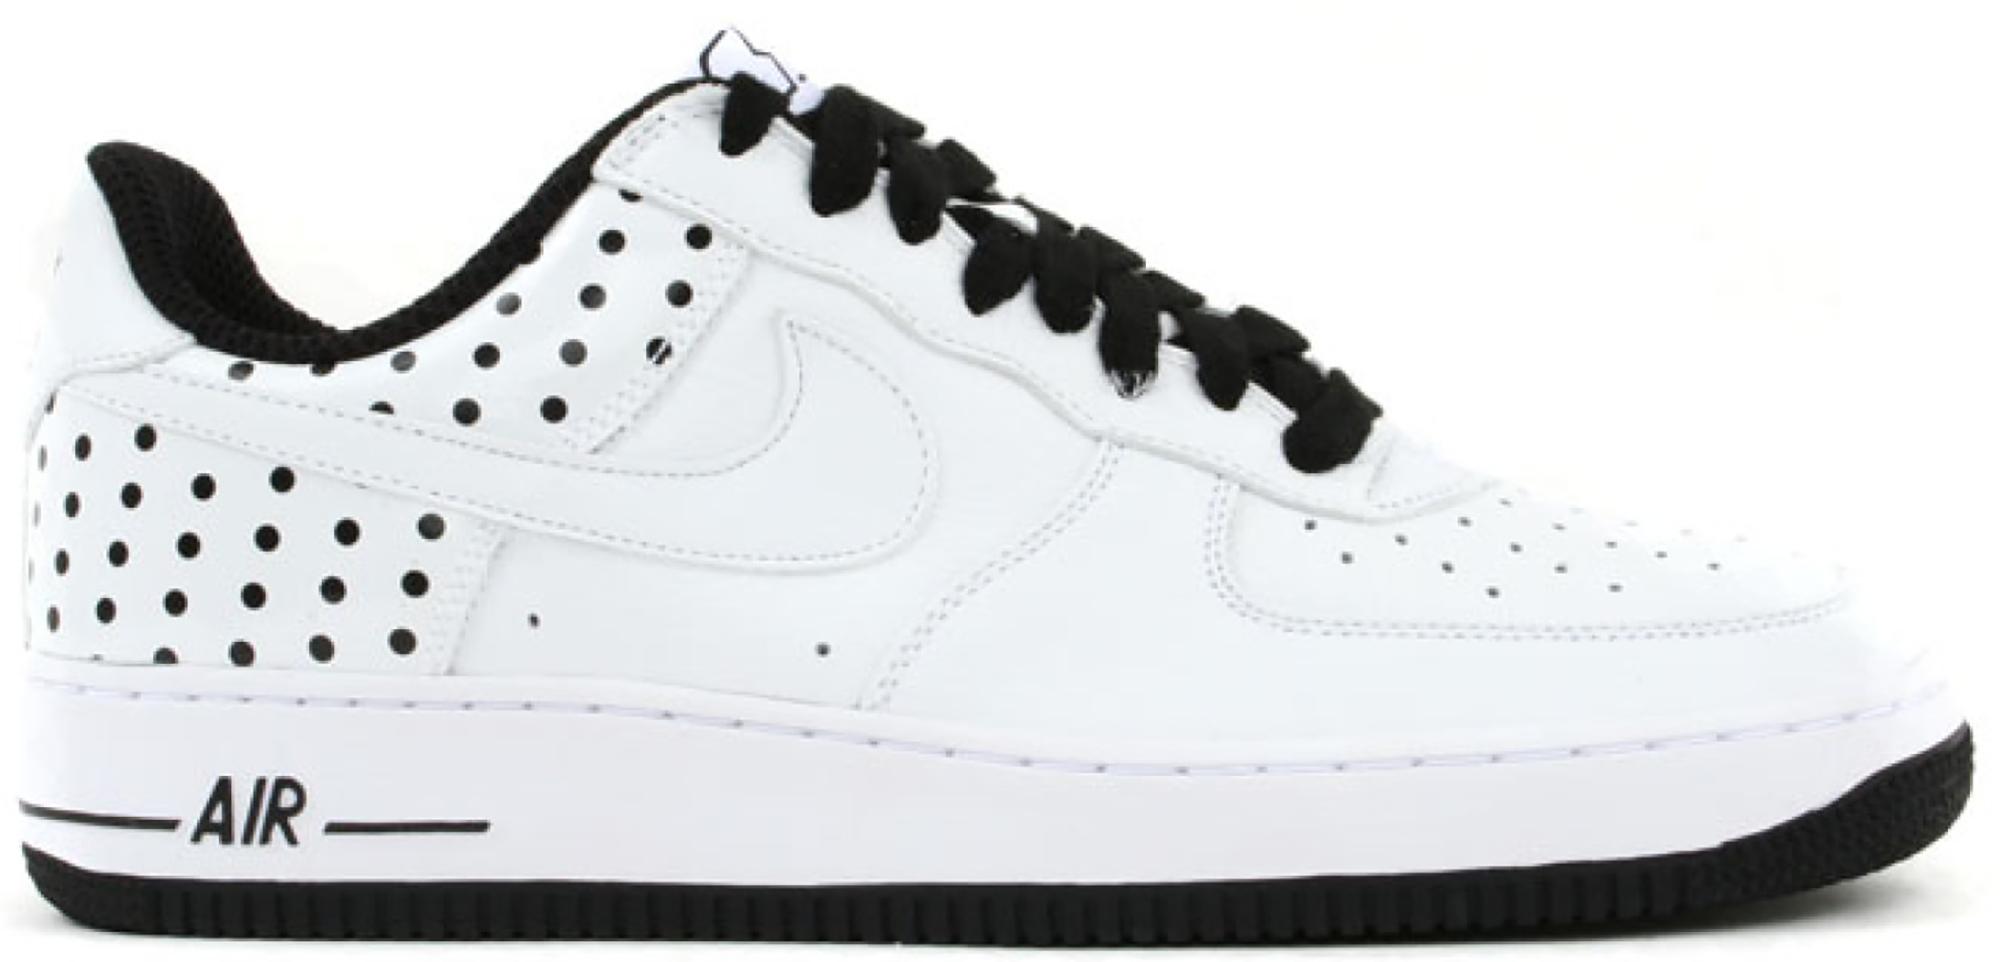 Nike Air Force 1 Low fragment Polka Dot